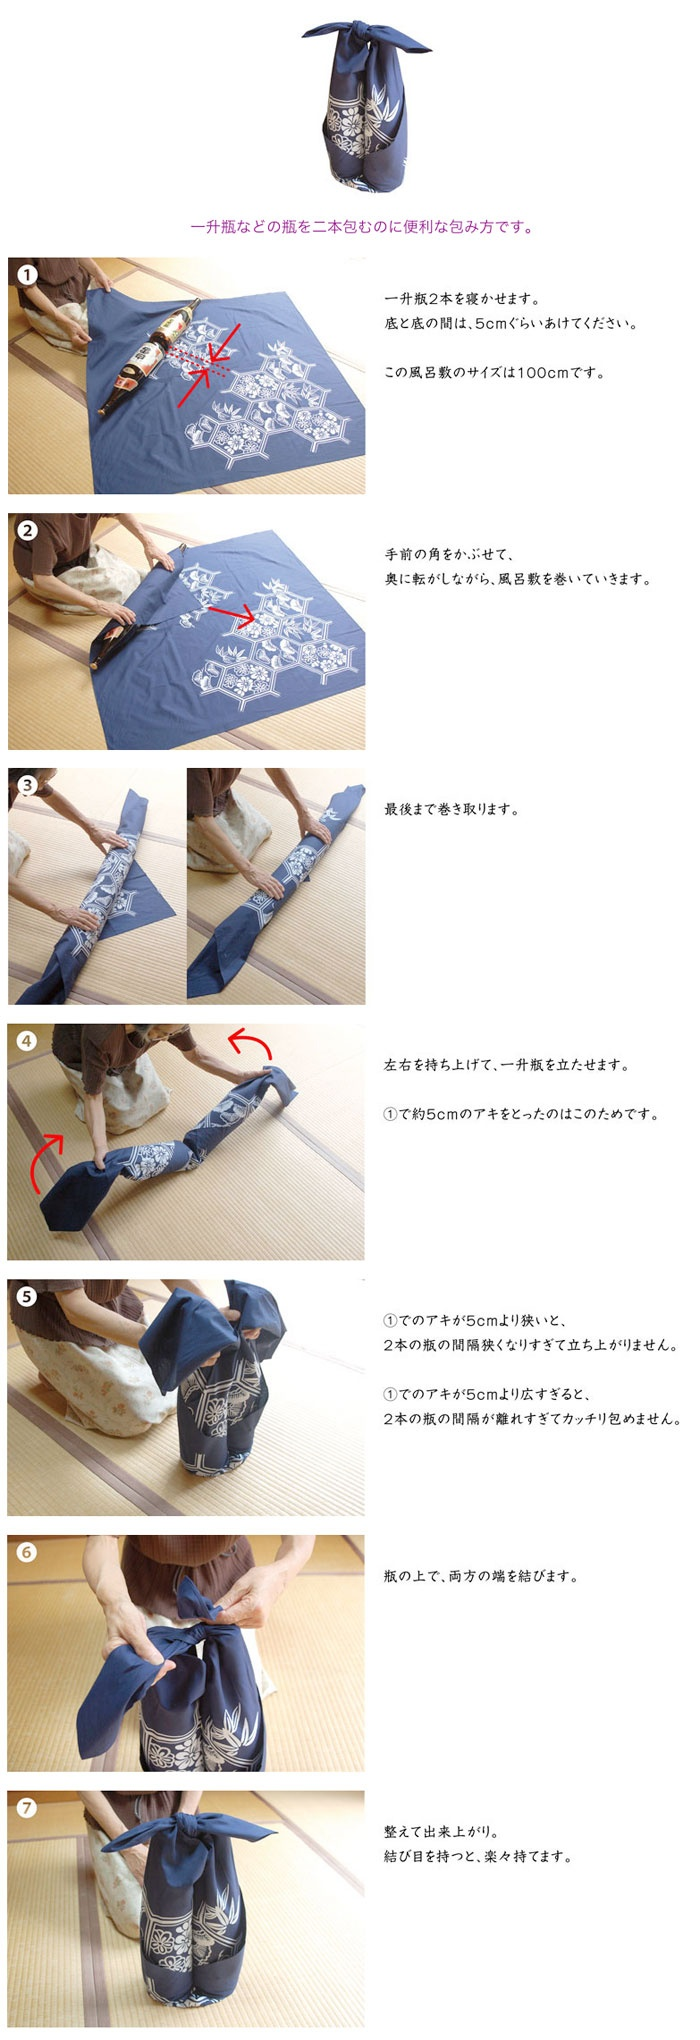 How to Wrap 2 Bottles in Furoshiki...